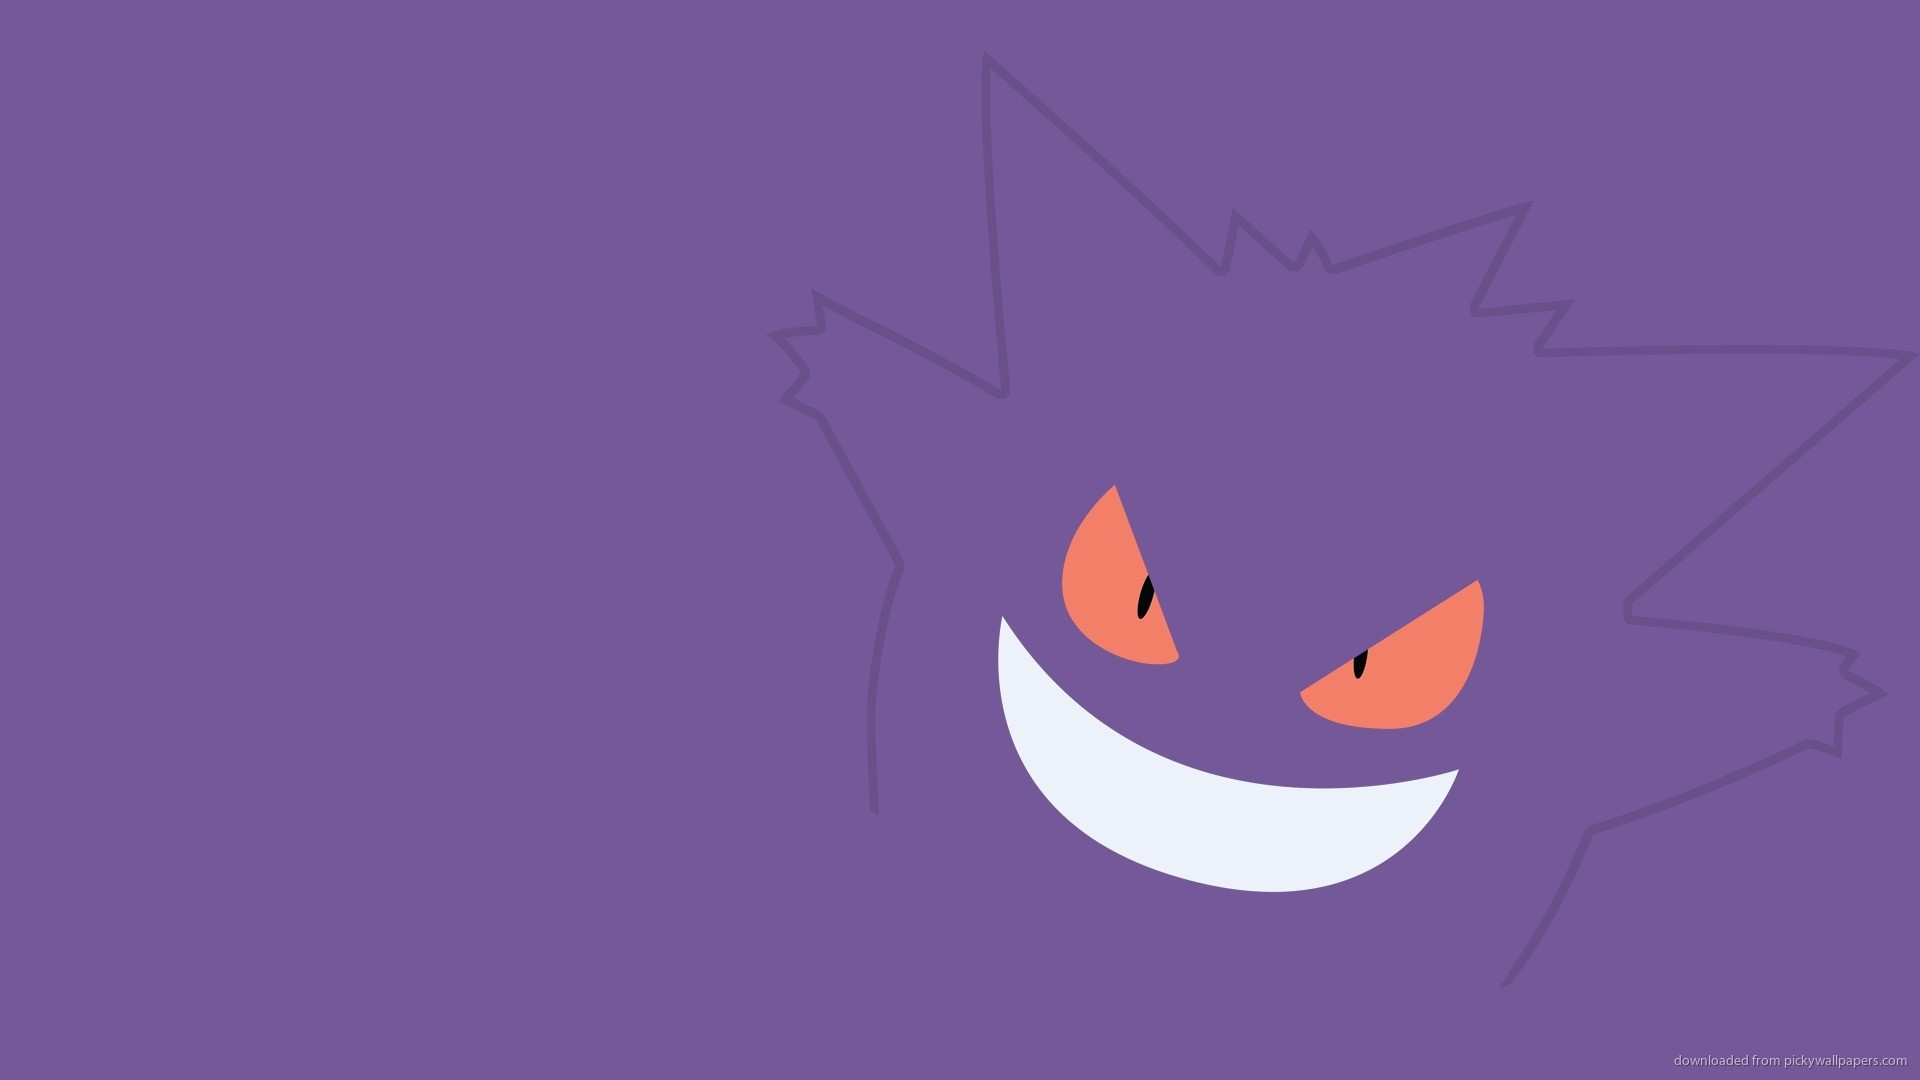 HD Simple Gengar Pokemon Wallpaper wallpaper